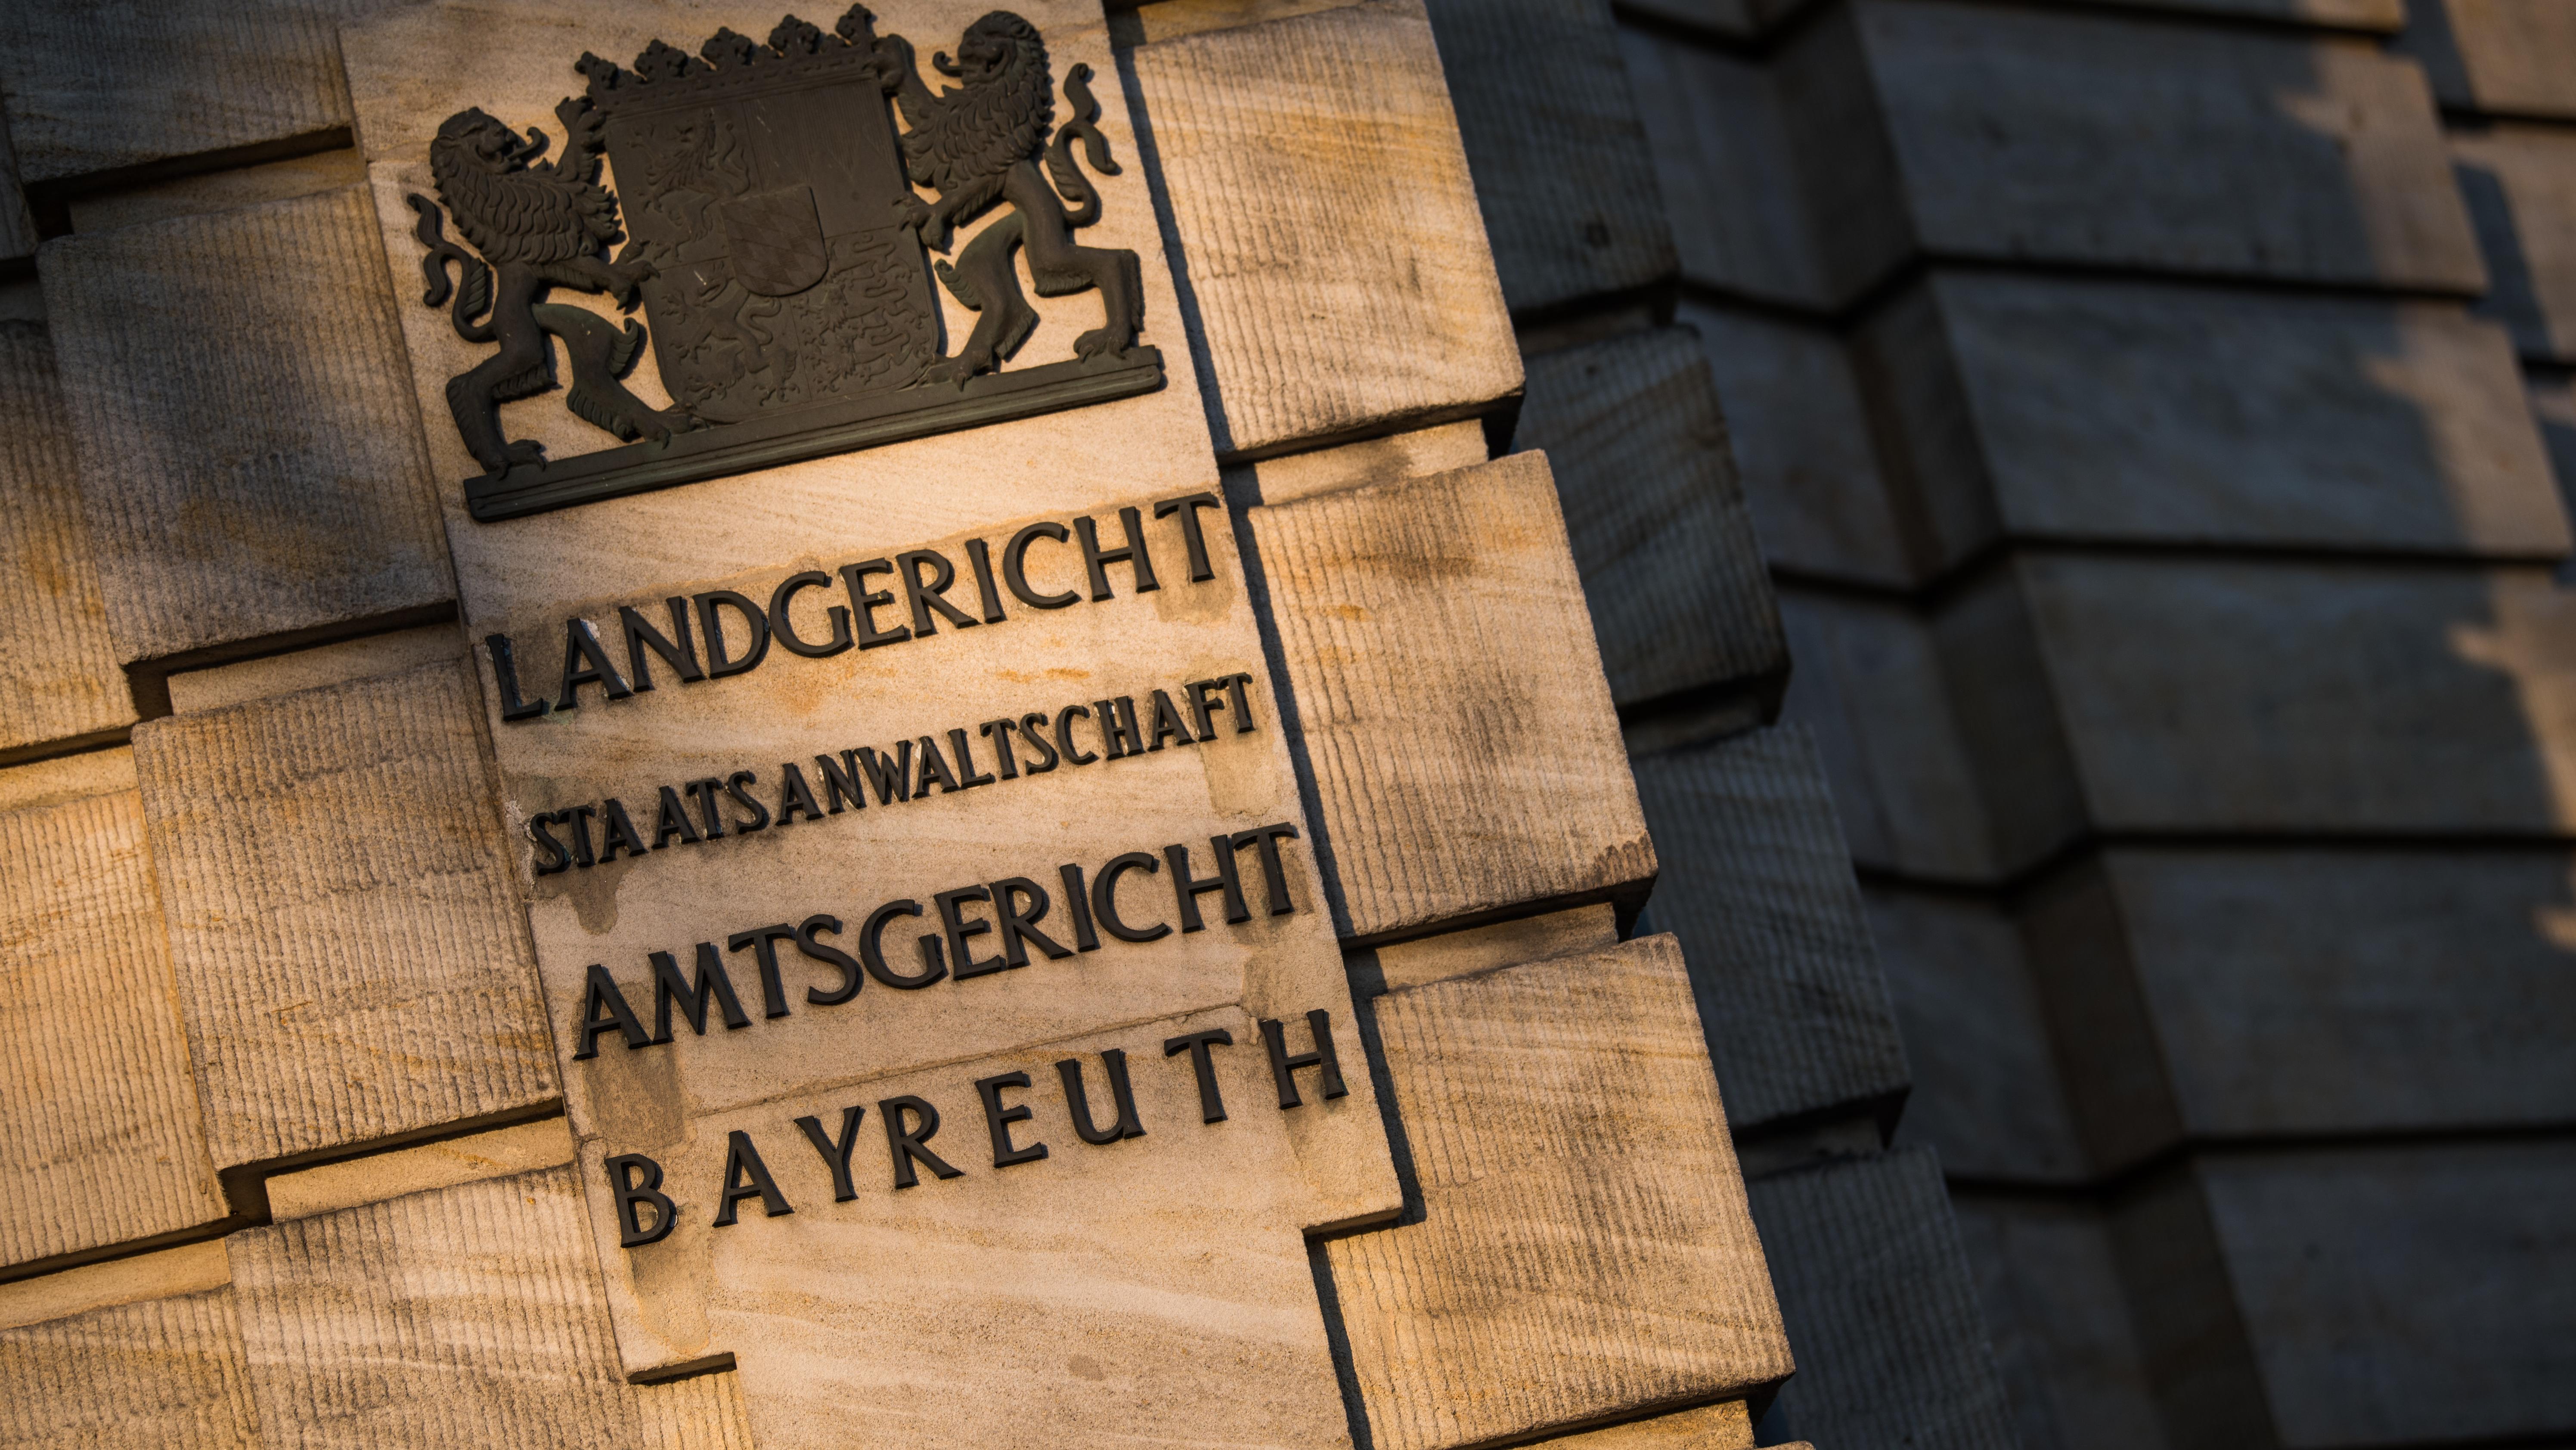 Staatsanwaltschaft in Bayreuth